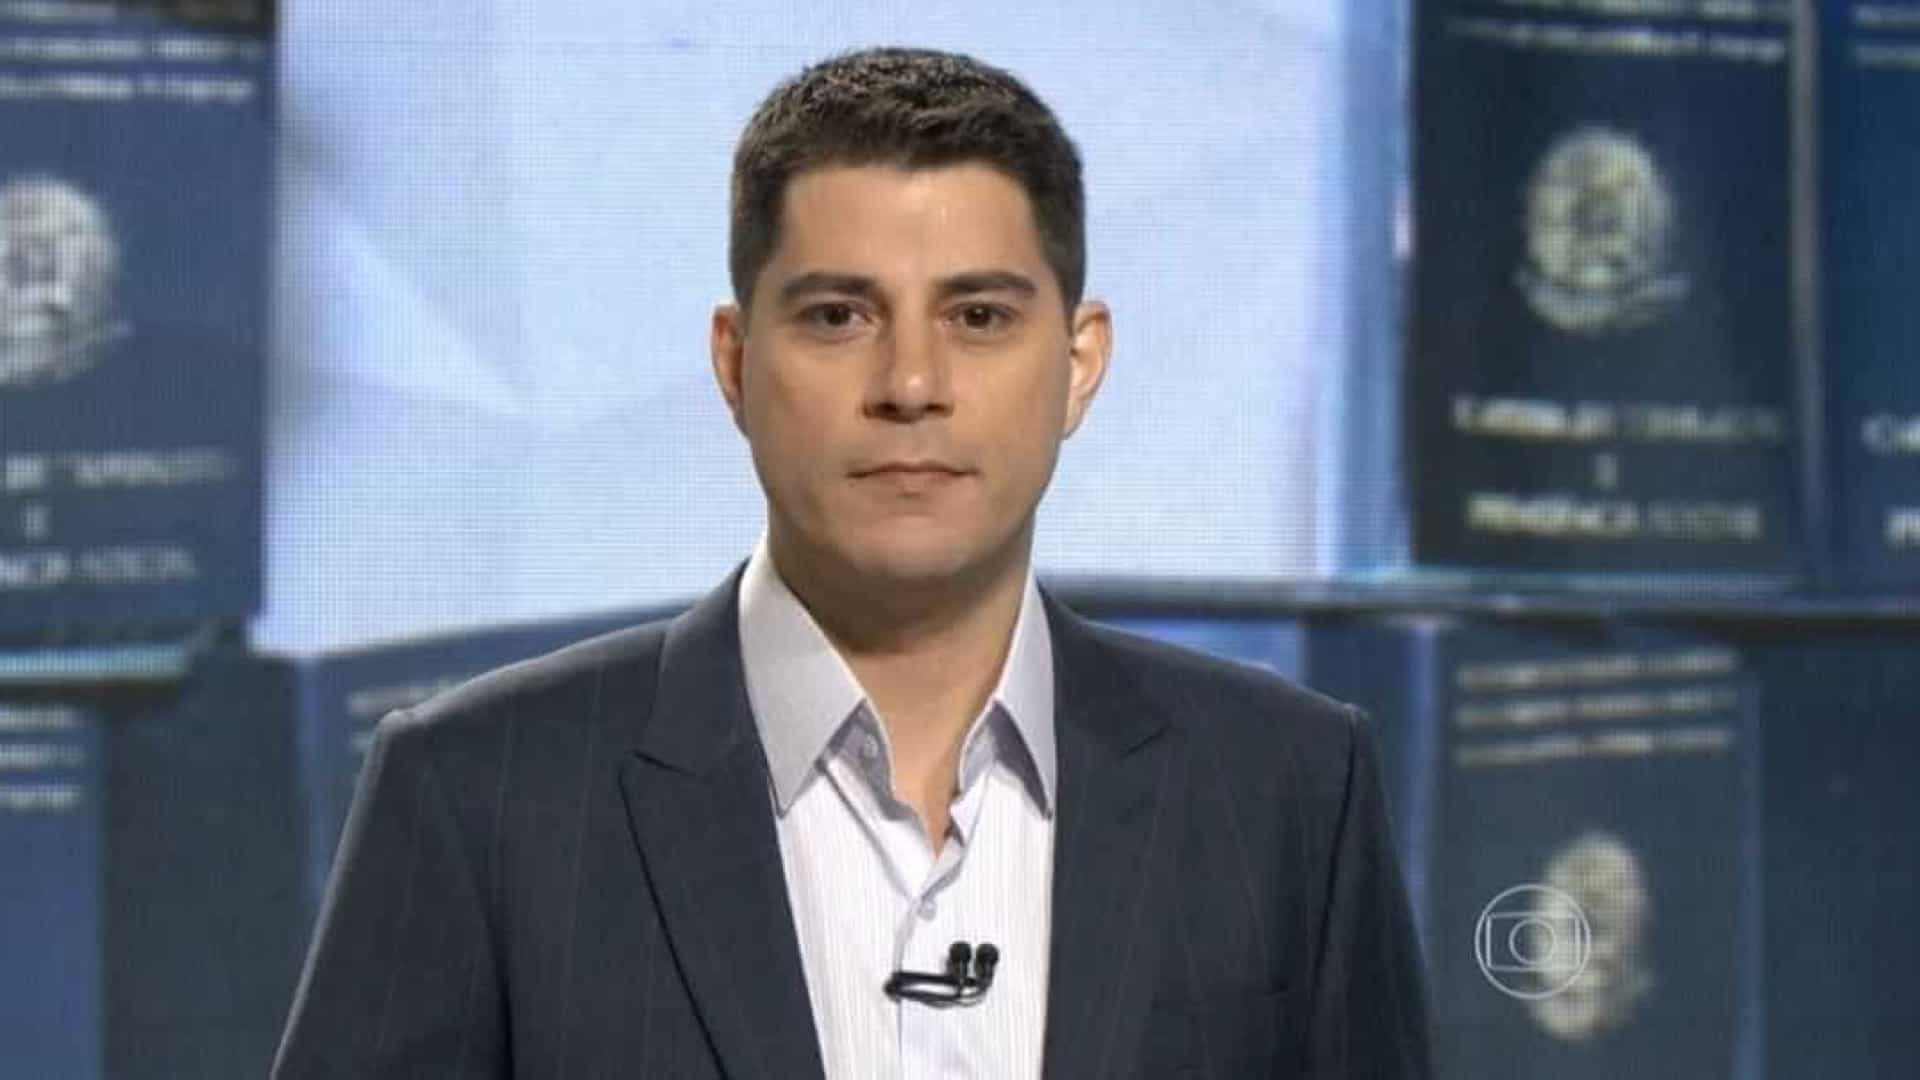 Evaristo Costa assina contrato de R$ 200 mil para ser garoto-propaganda